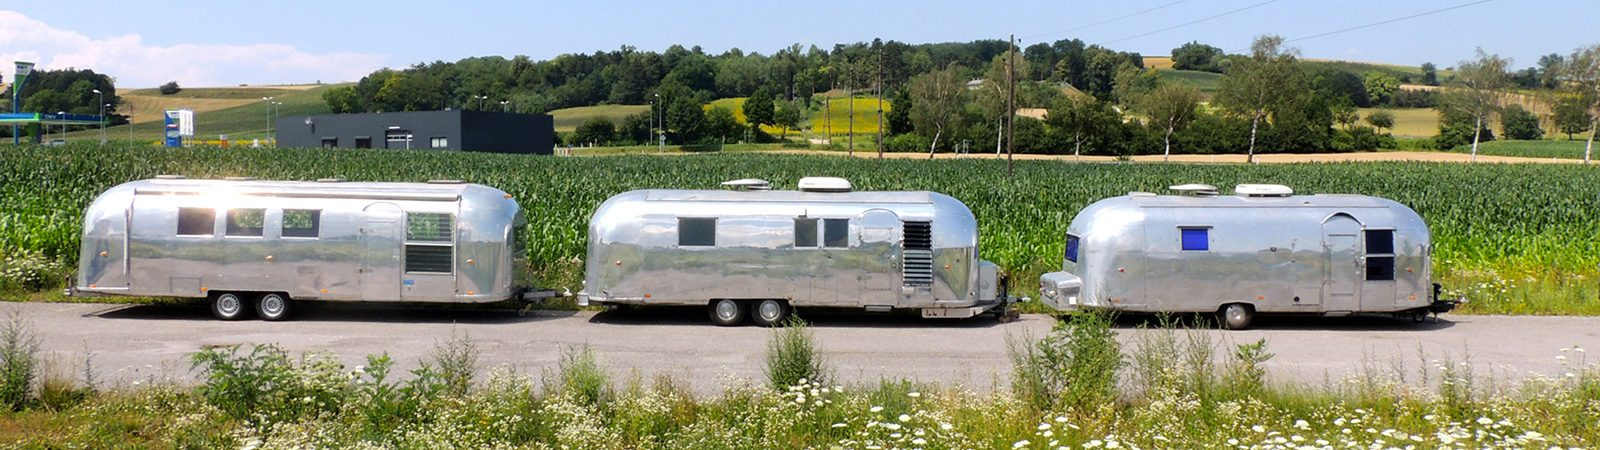 silverbase-trailer-bewegung